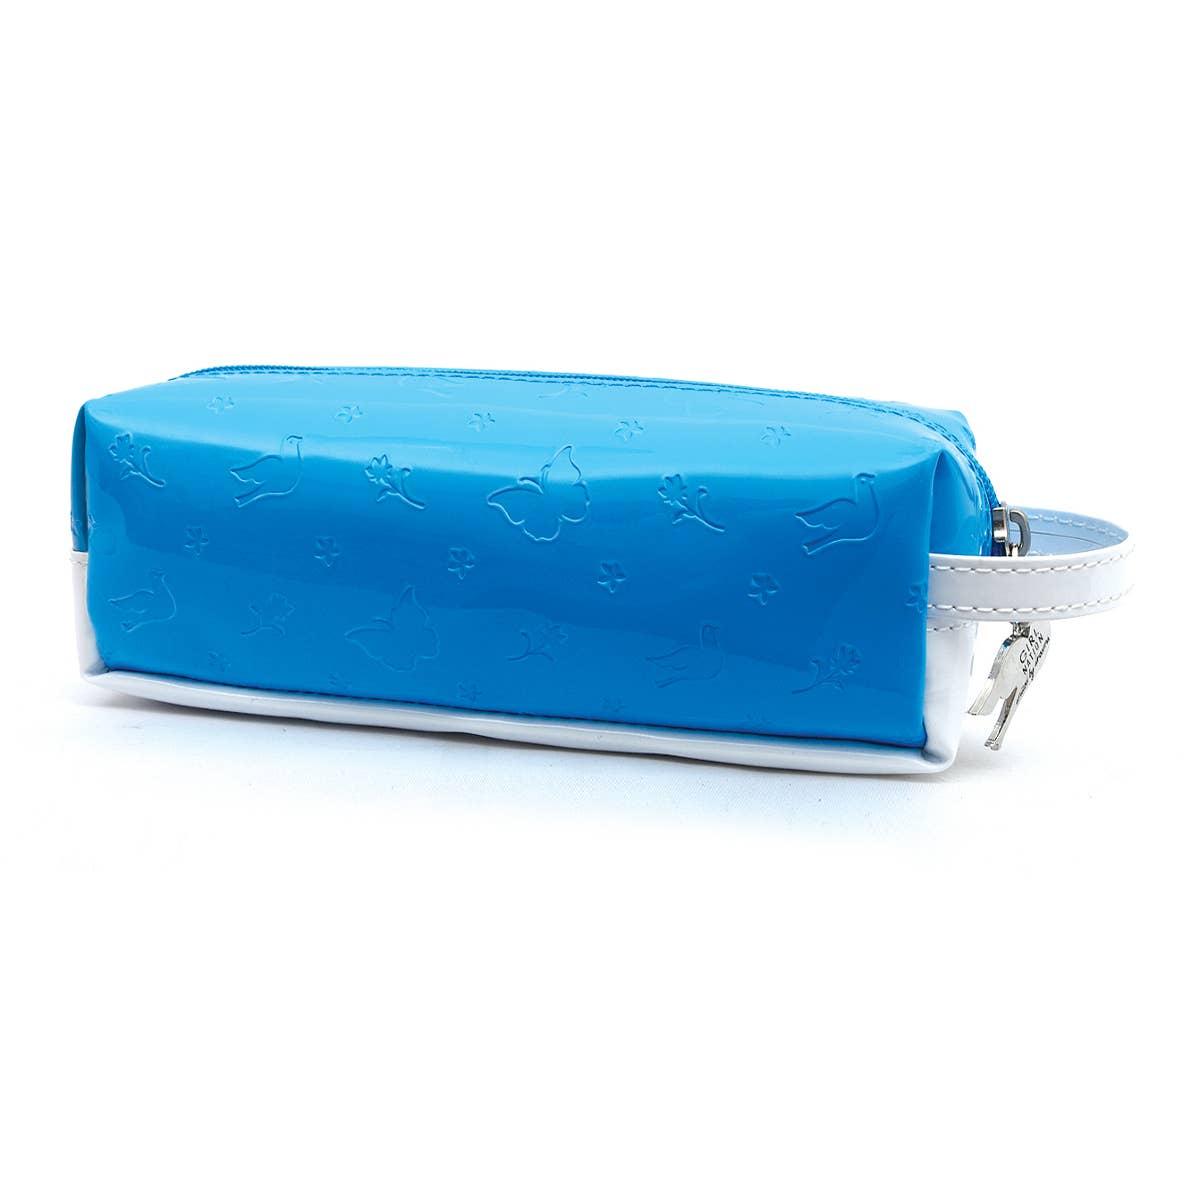 Brains & Beauty Case-Electro BLUE | Trada Marketplace